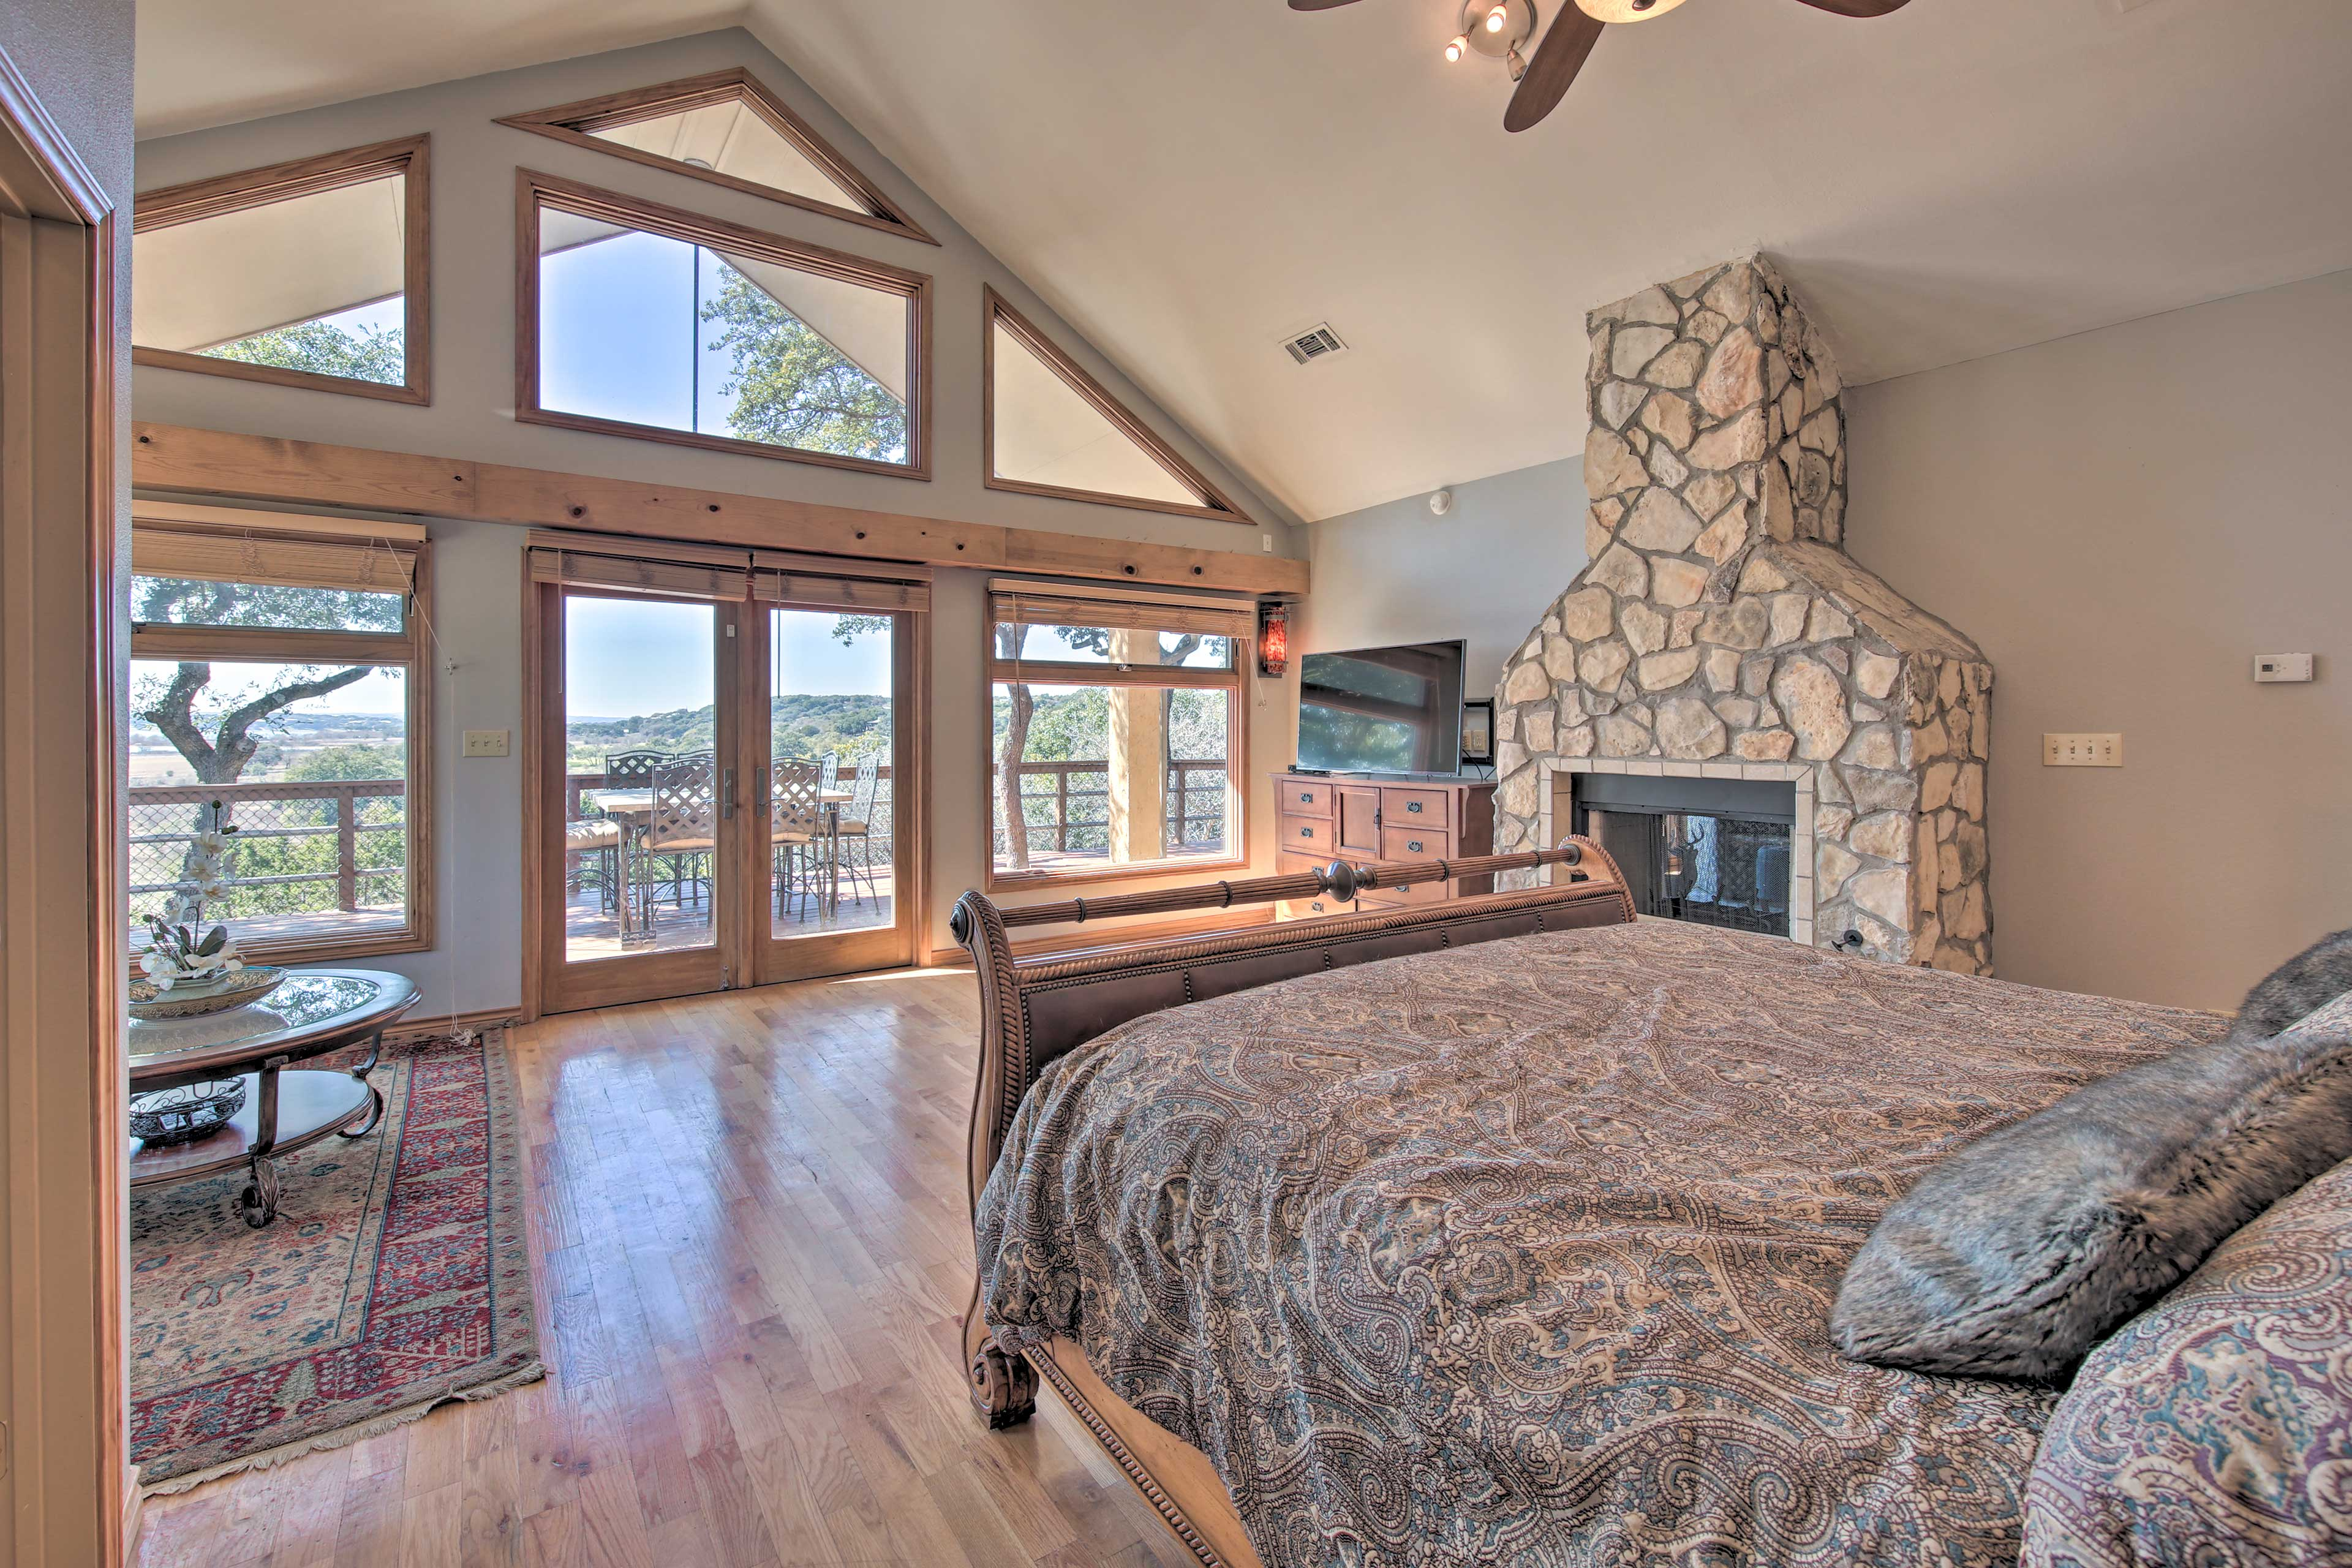 Sleep sound in this stunning room.